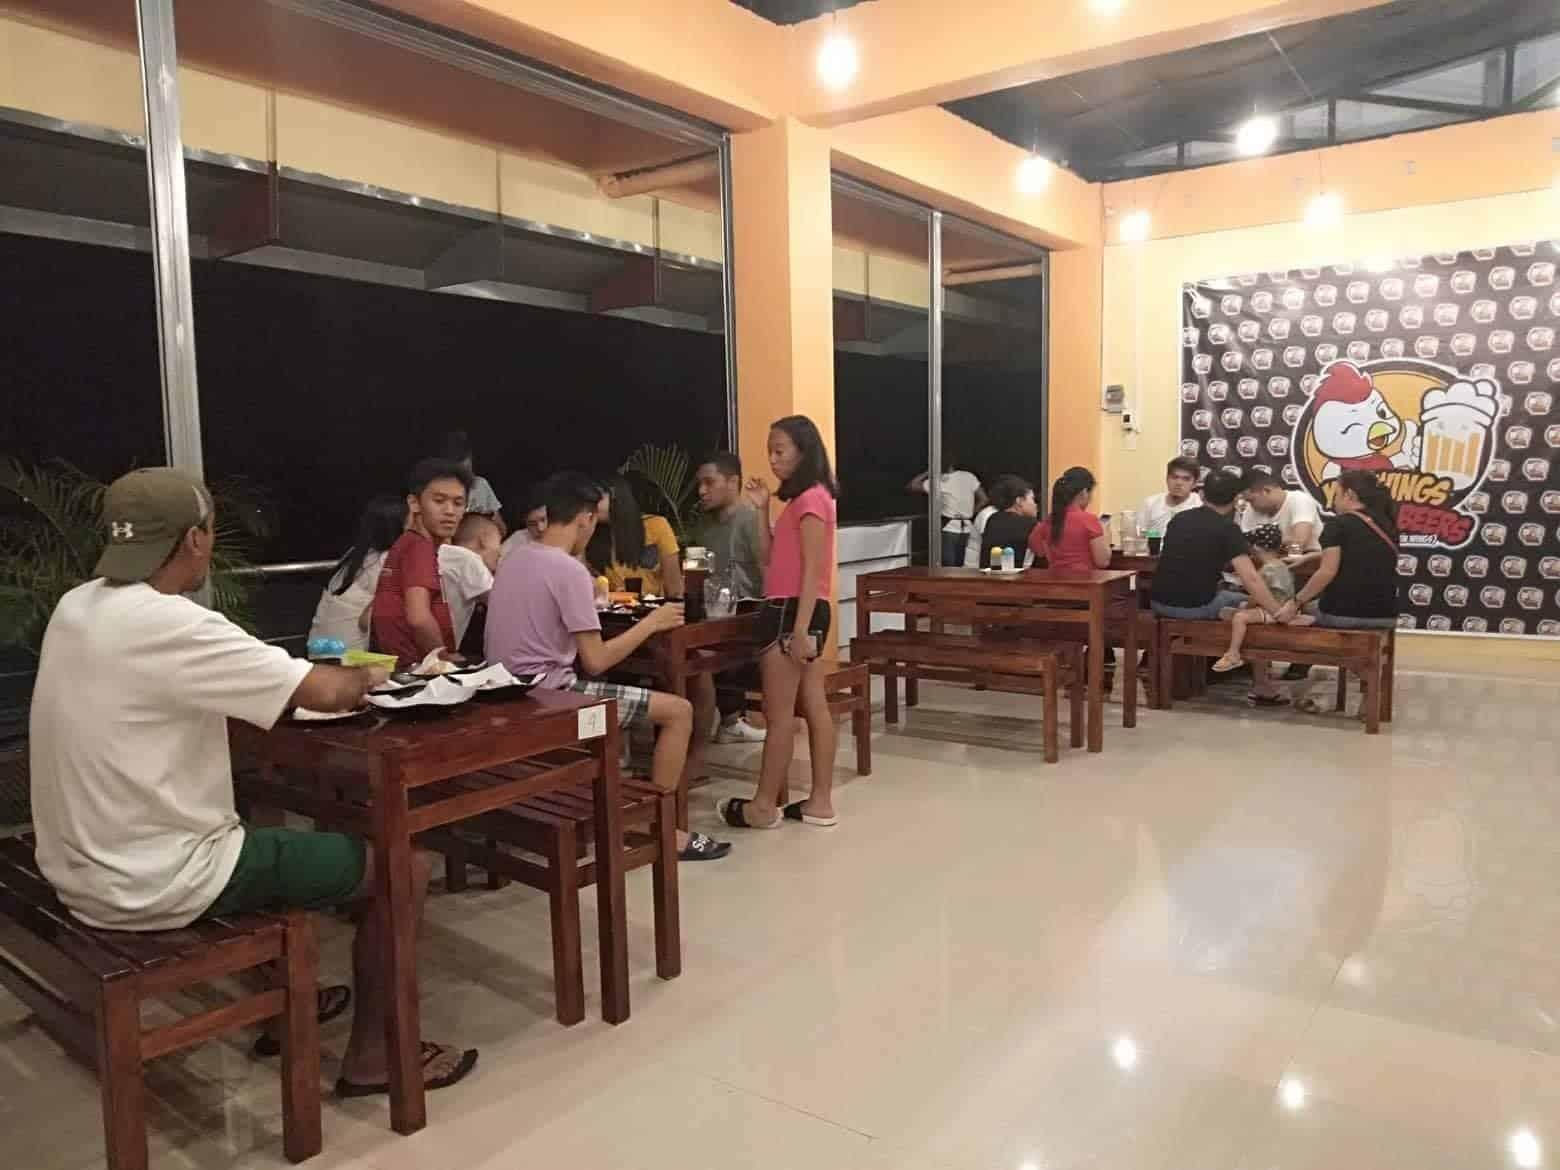 Yot Chicken Wings and Beer Unlimited Cebu (3)